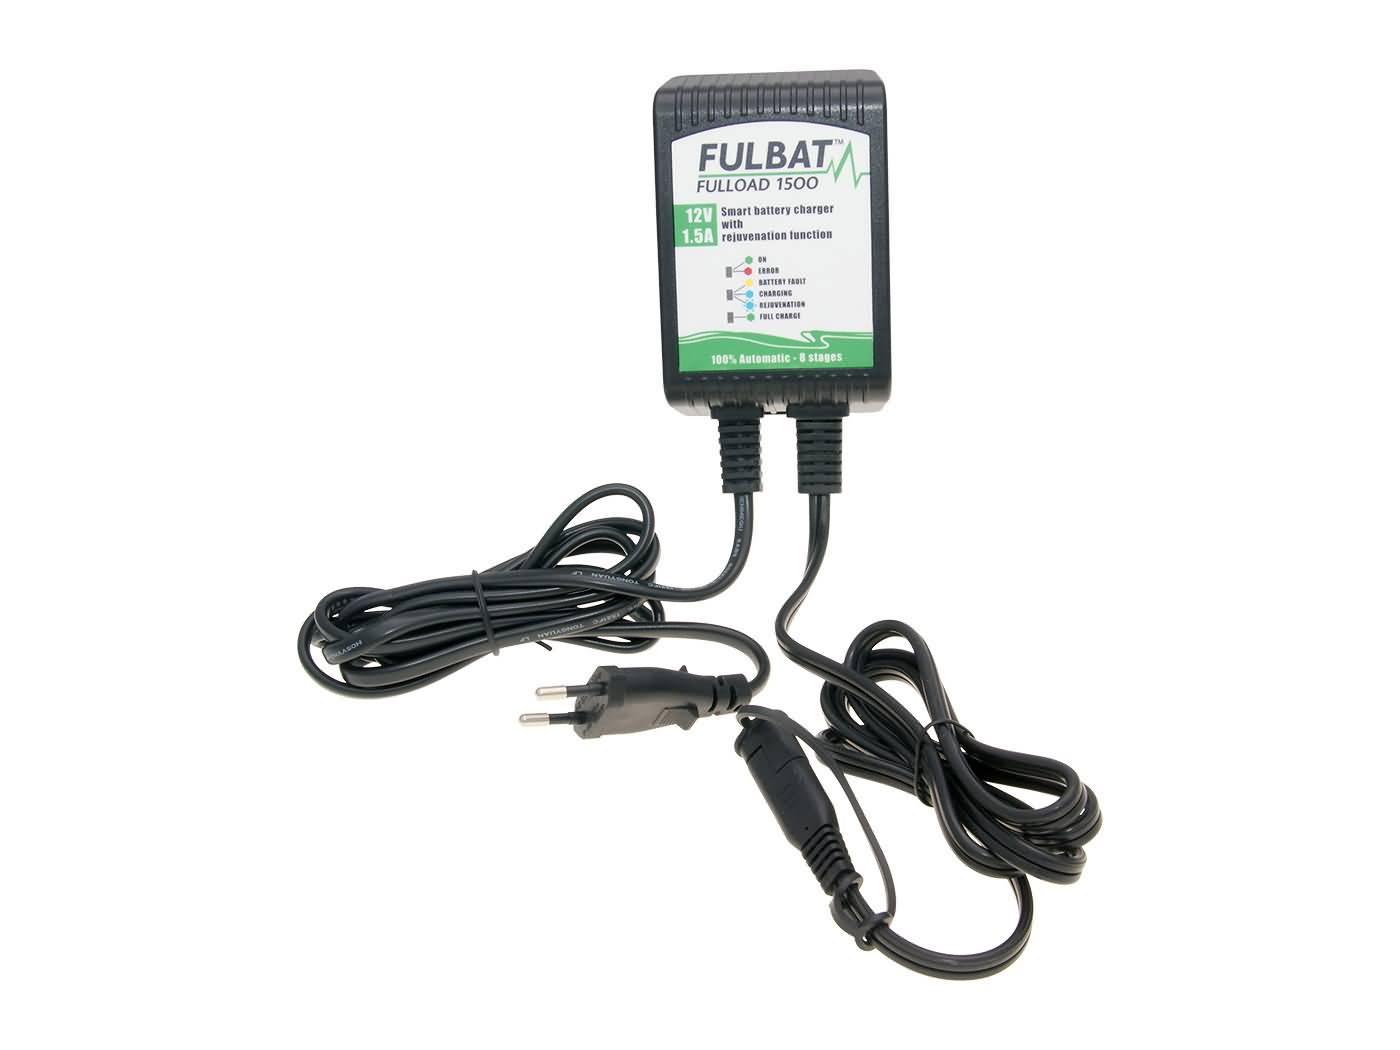 Battery Charger Fulbat Fulload Fl For 12v Lead Based Mf Gel 4 120ah